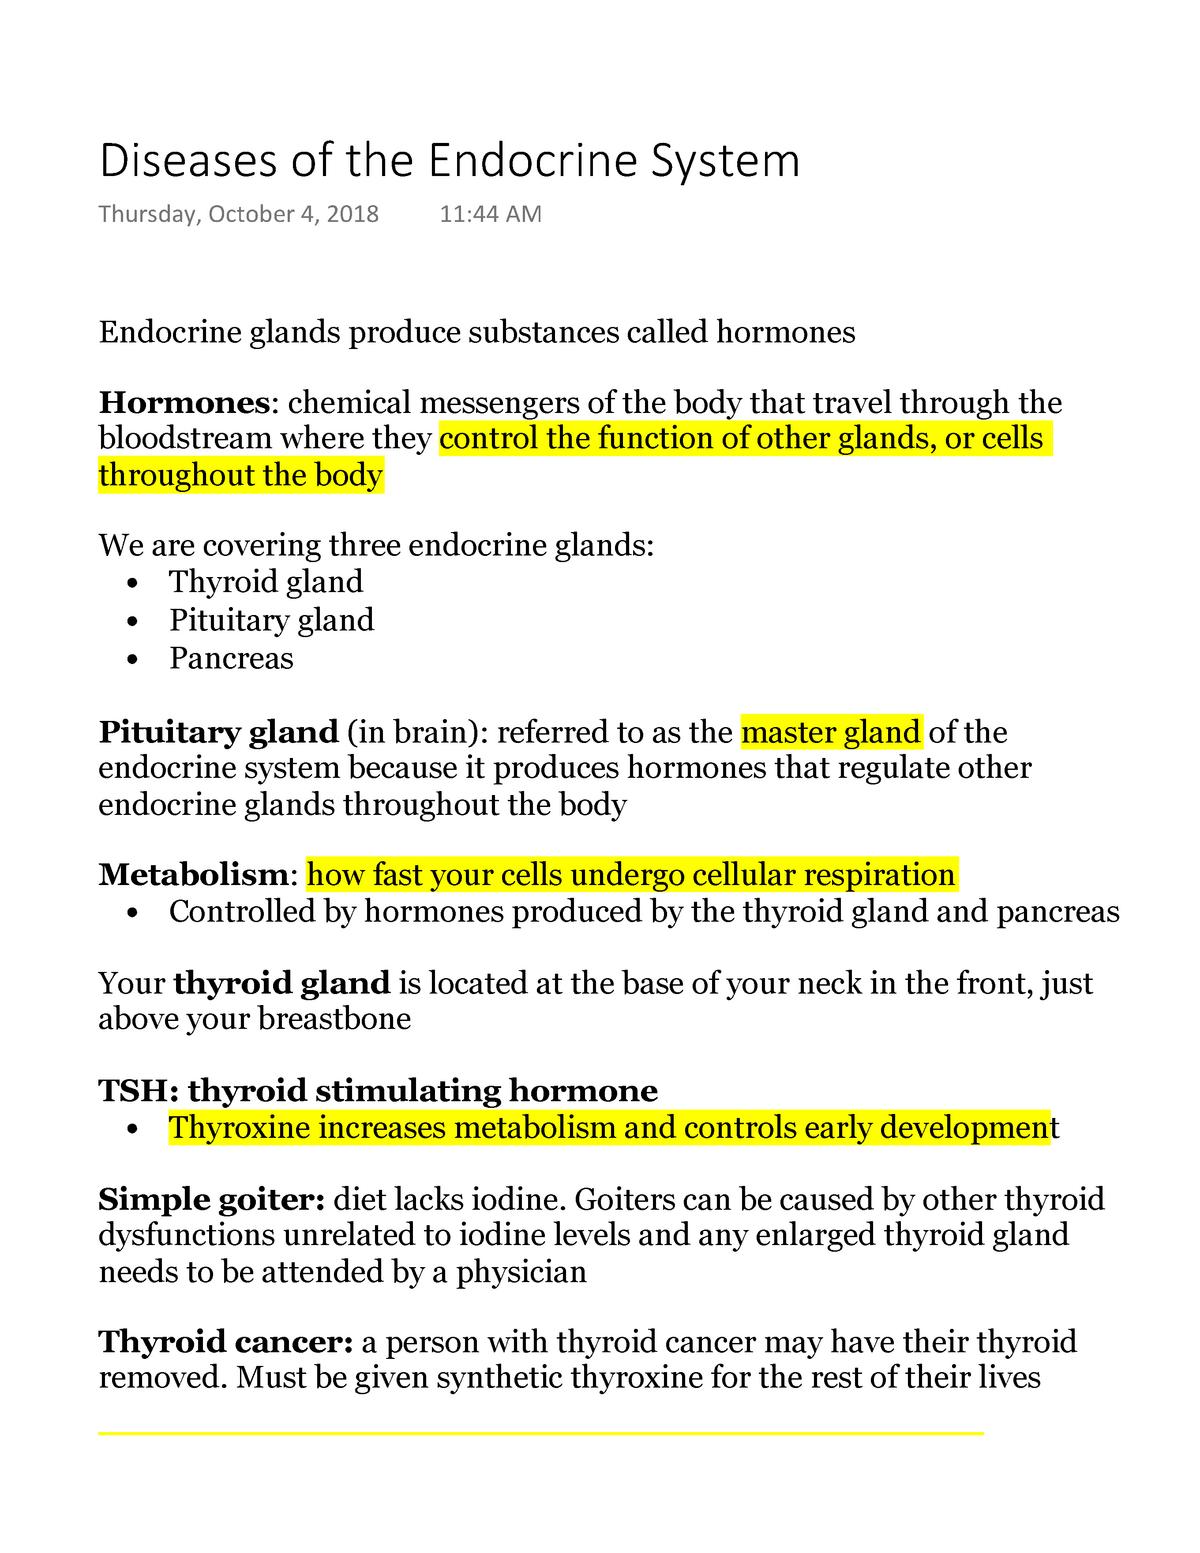 Diseases Of The Endocrine System Biol 10003 Tcu Studocu